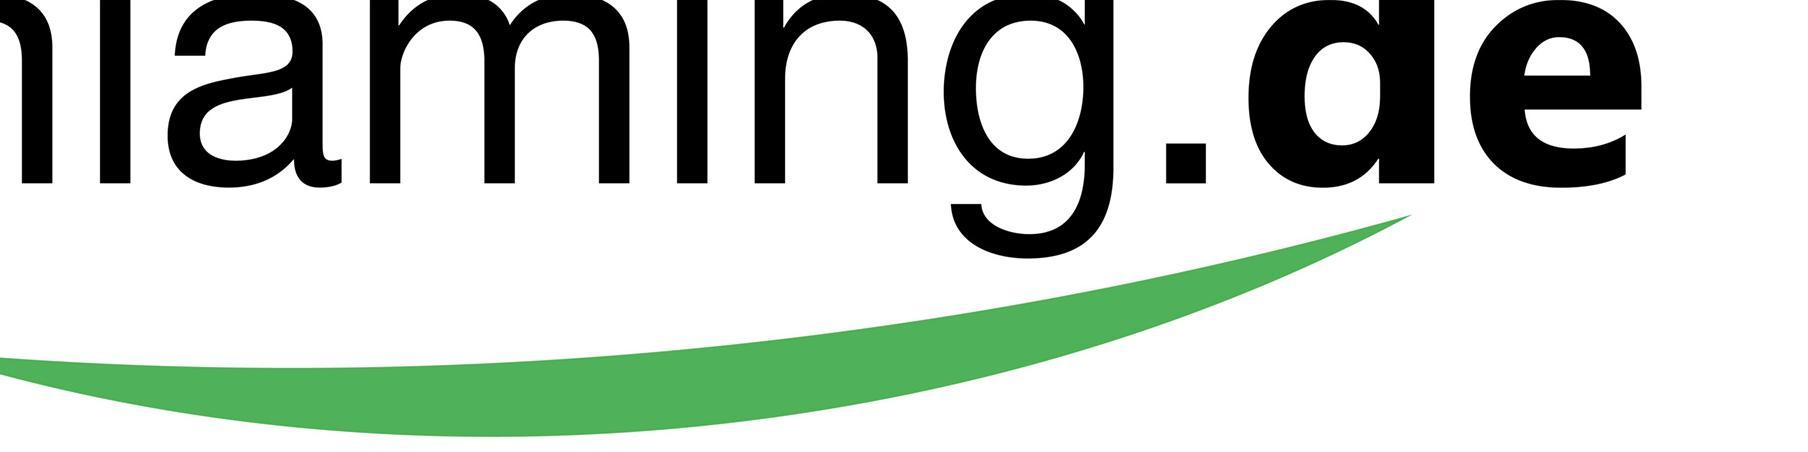 miaming.de- Logo - Bewertungen